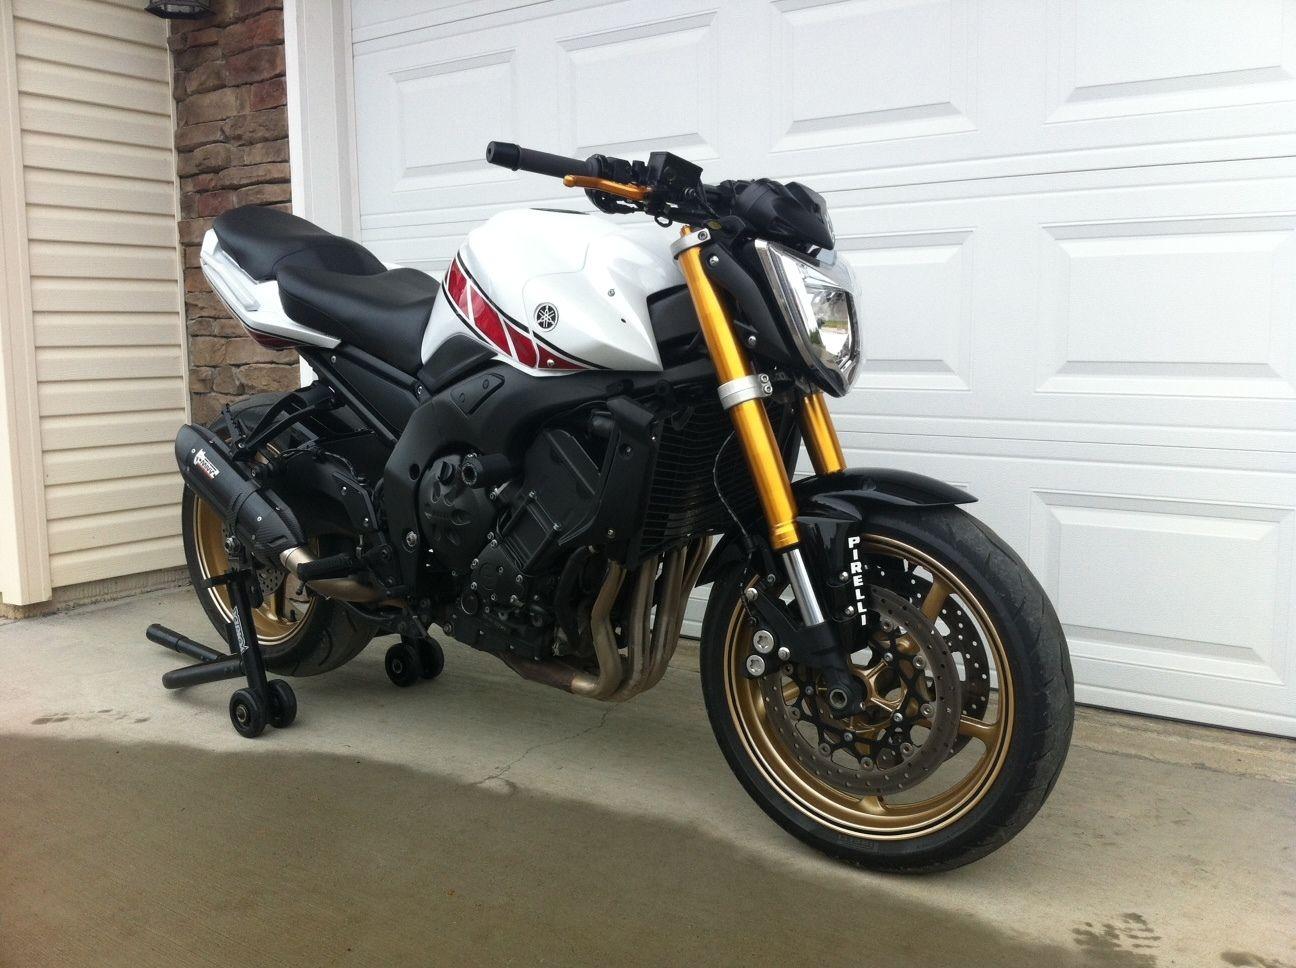 Yamaha FZ1N / FZ1 / Naked Fazer 1000 / Nationwide Delivery